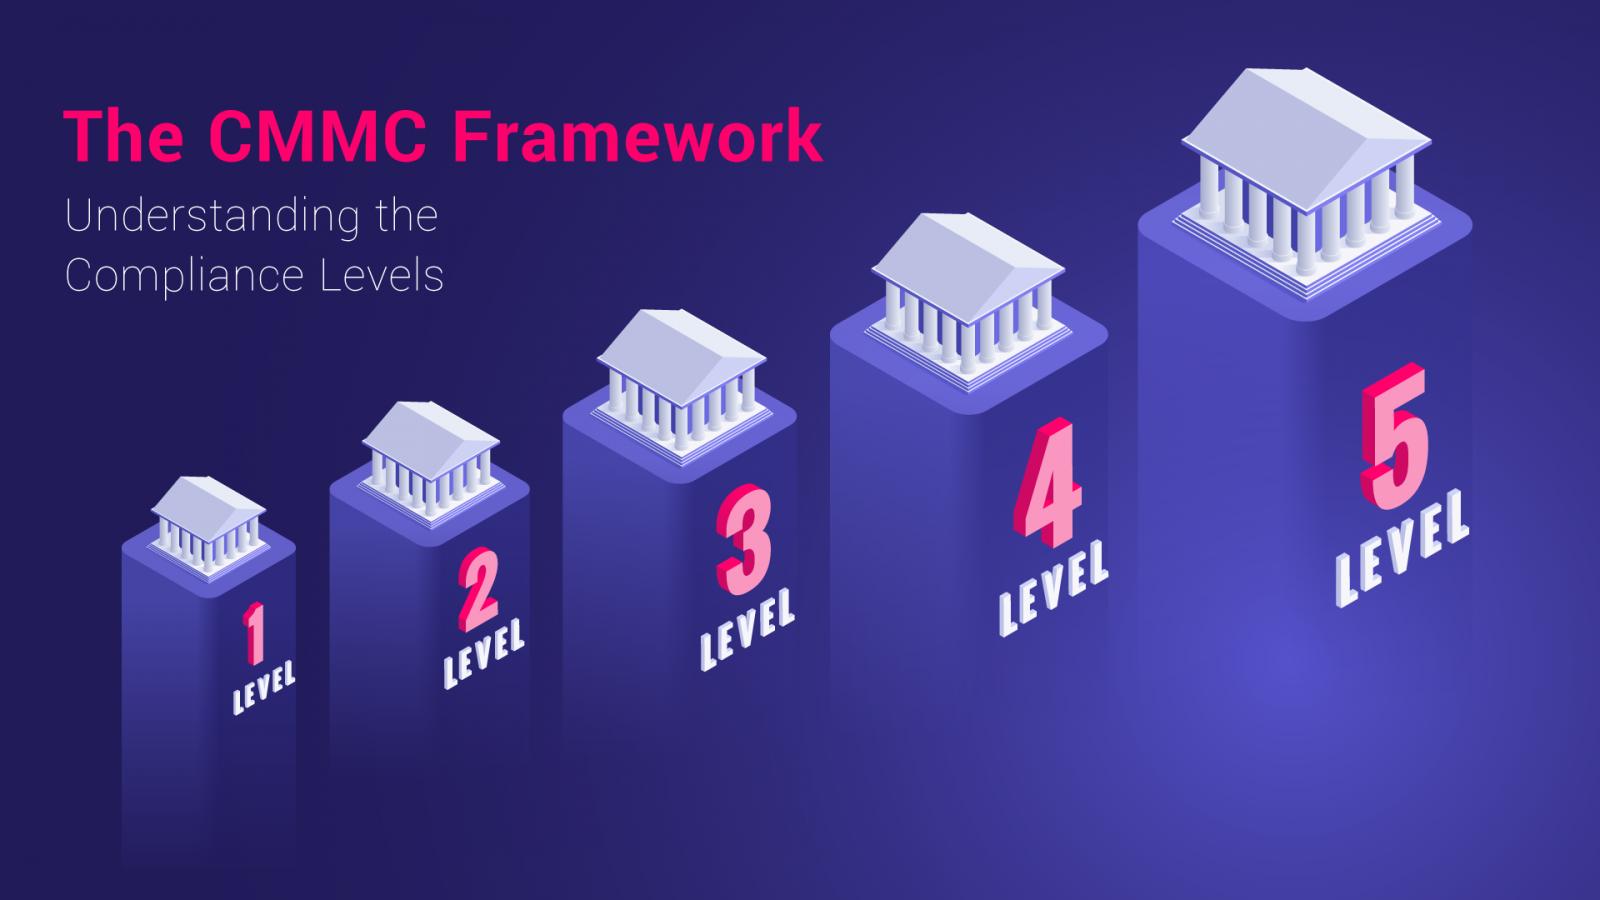 CMMC Framework Levels